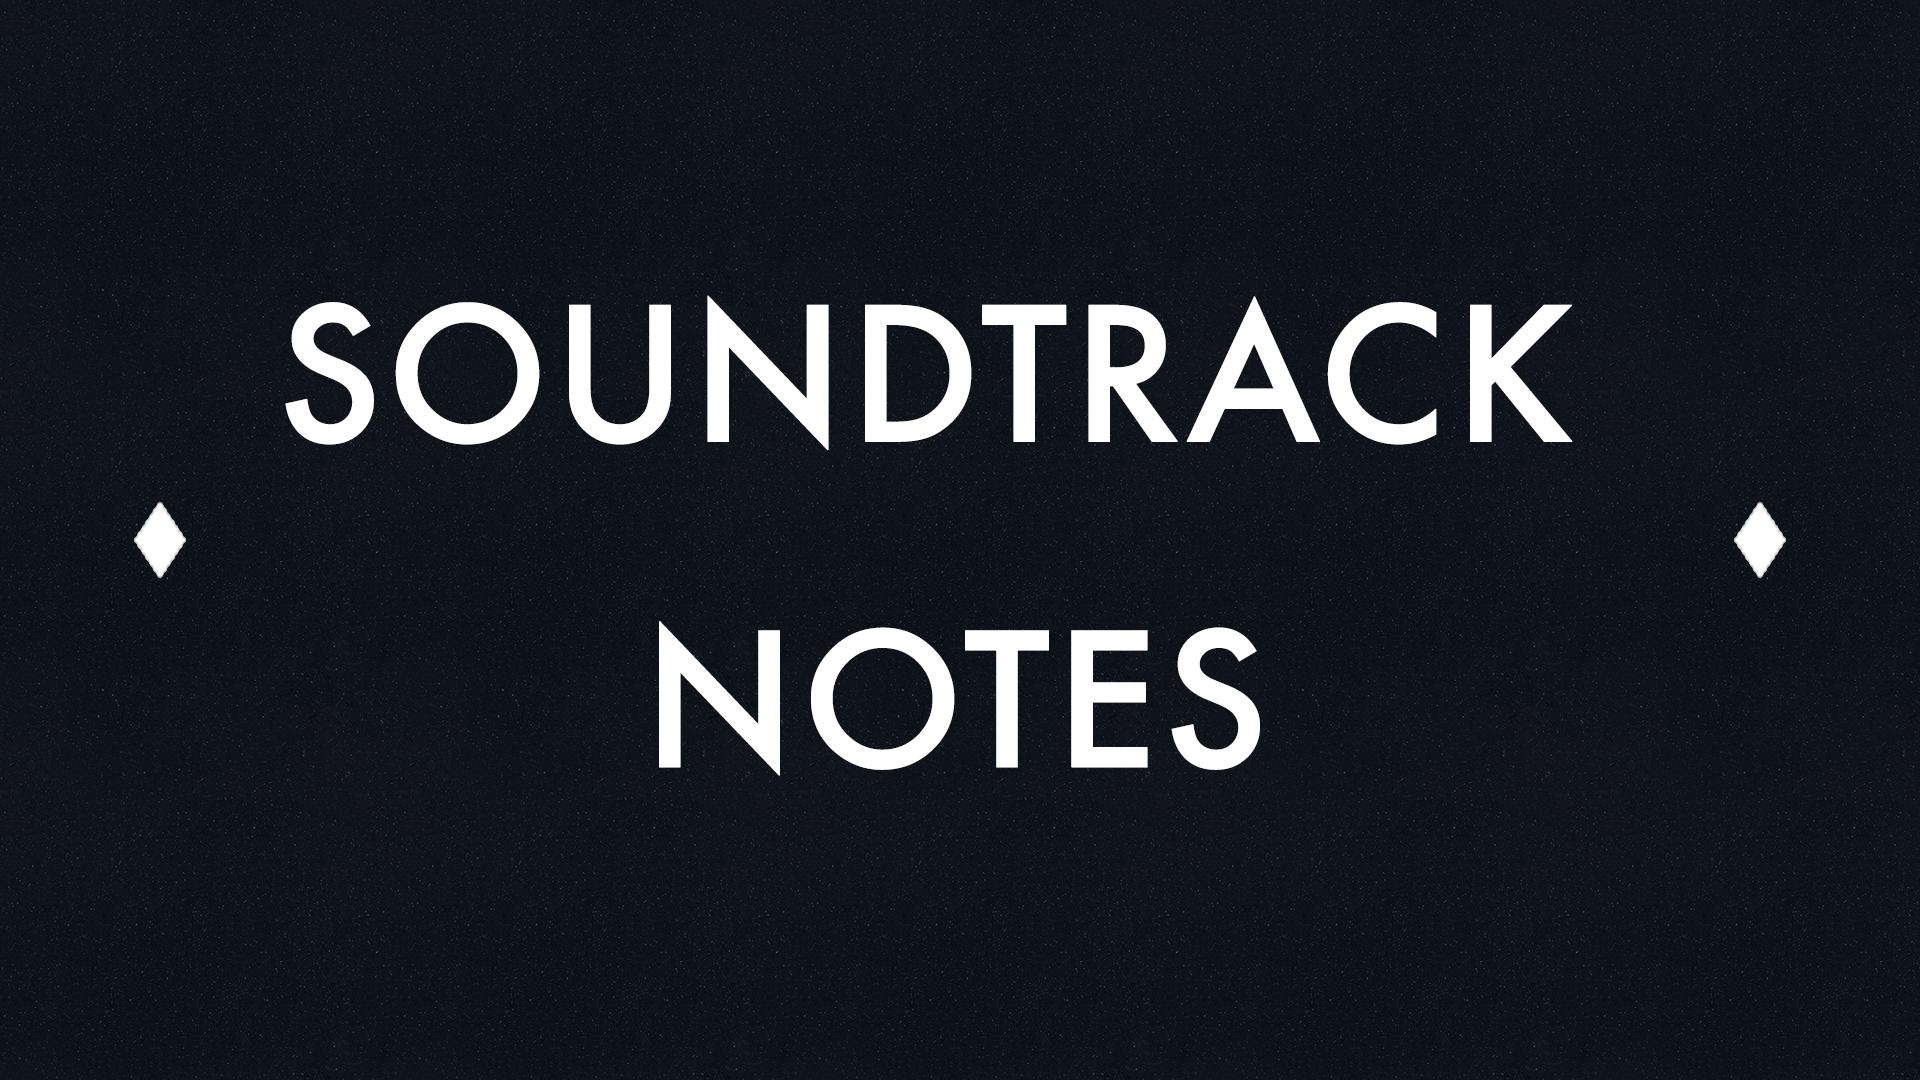 Soundtrack Notes